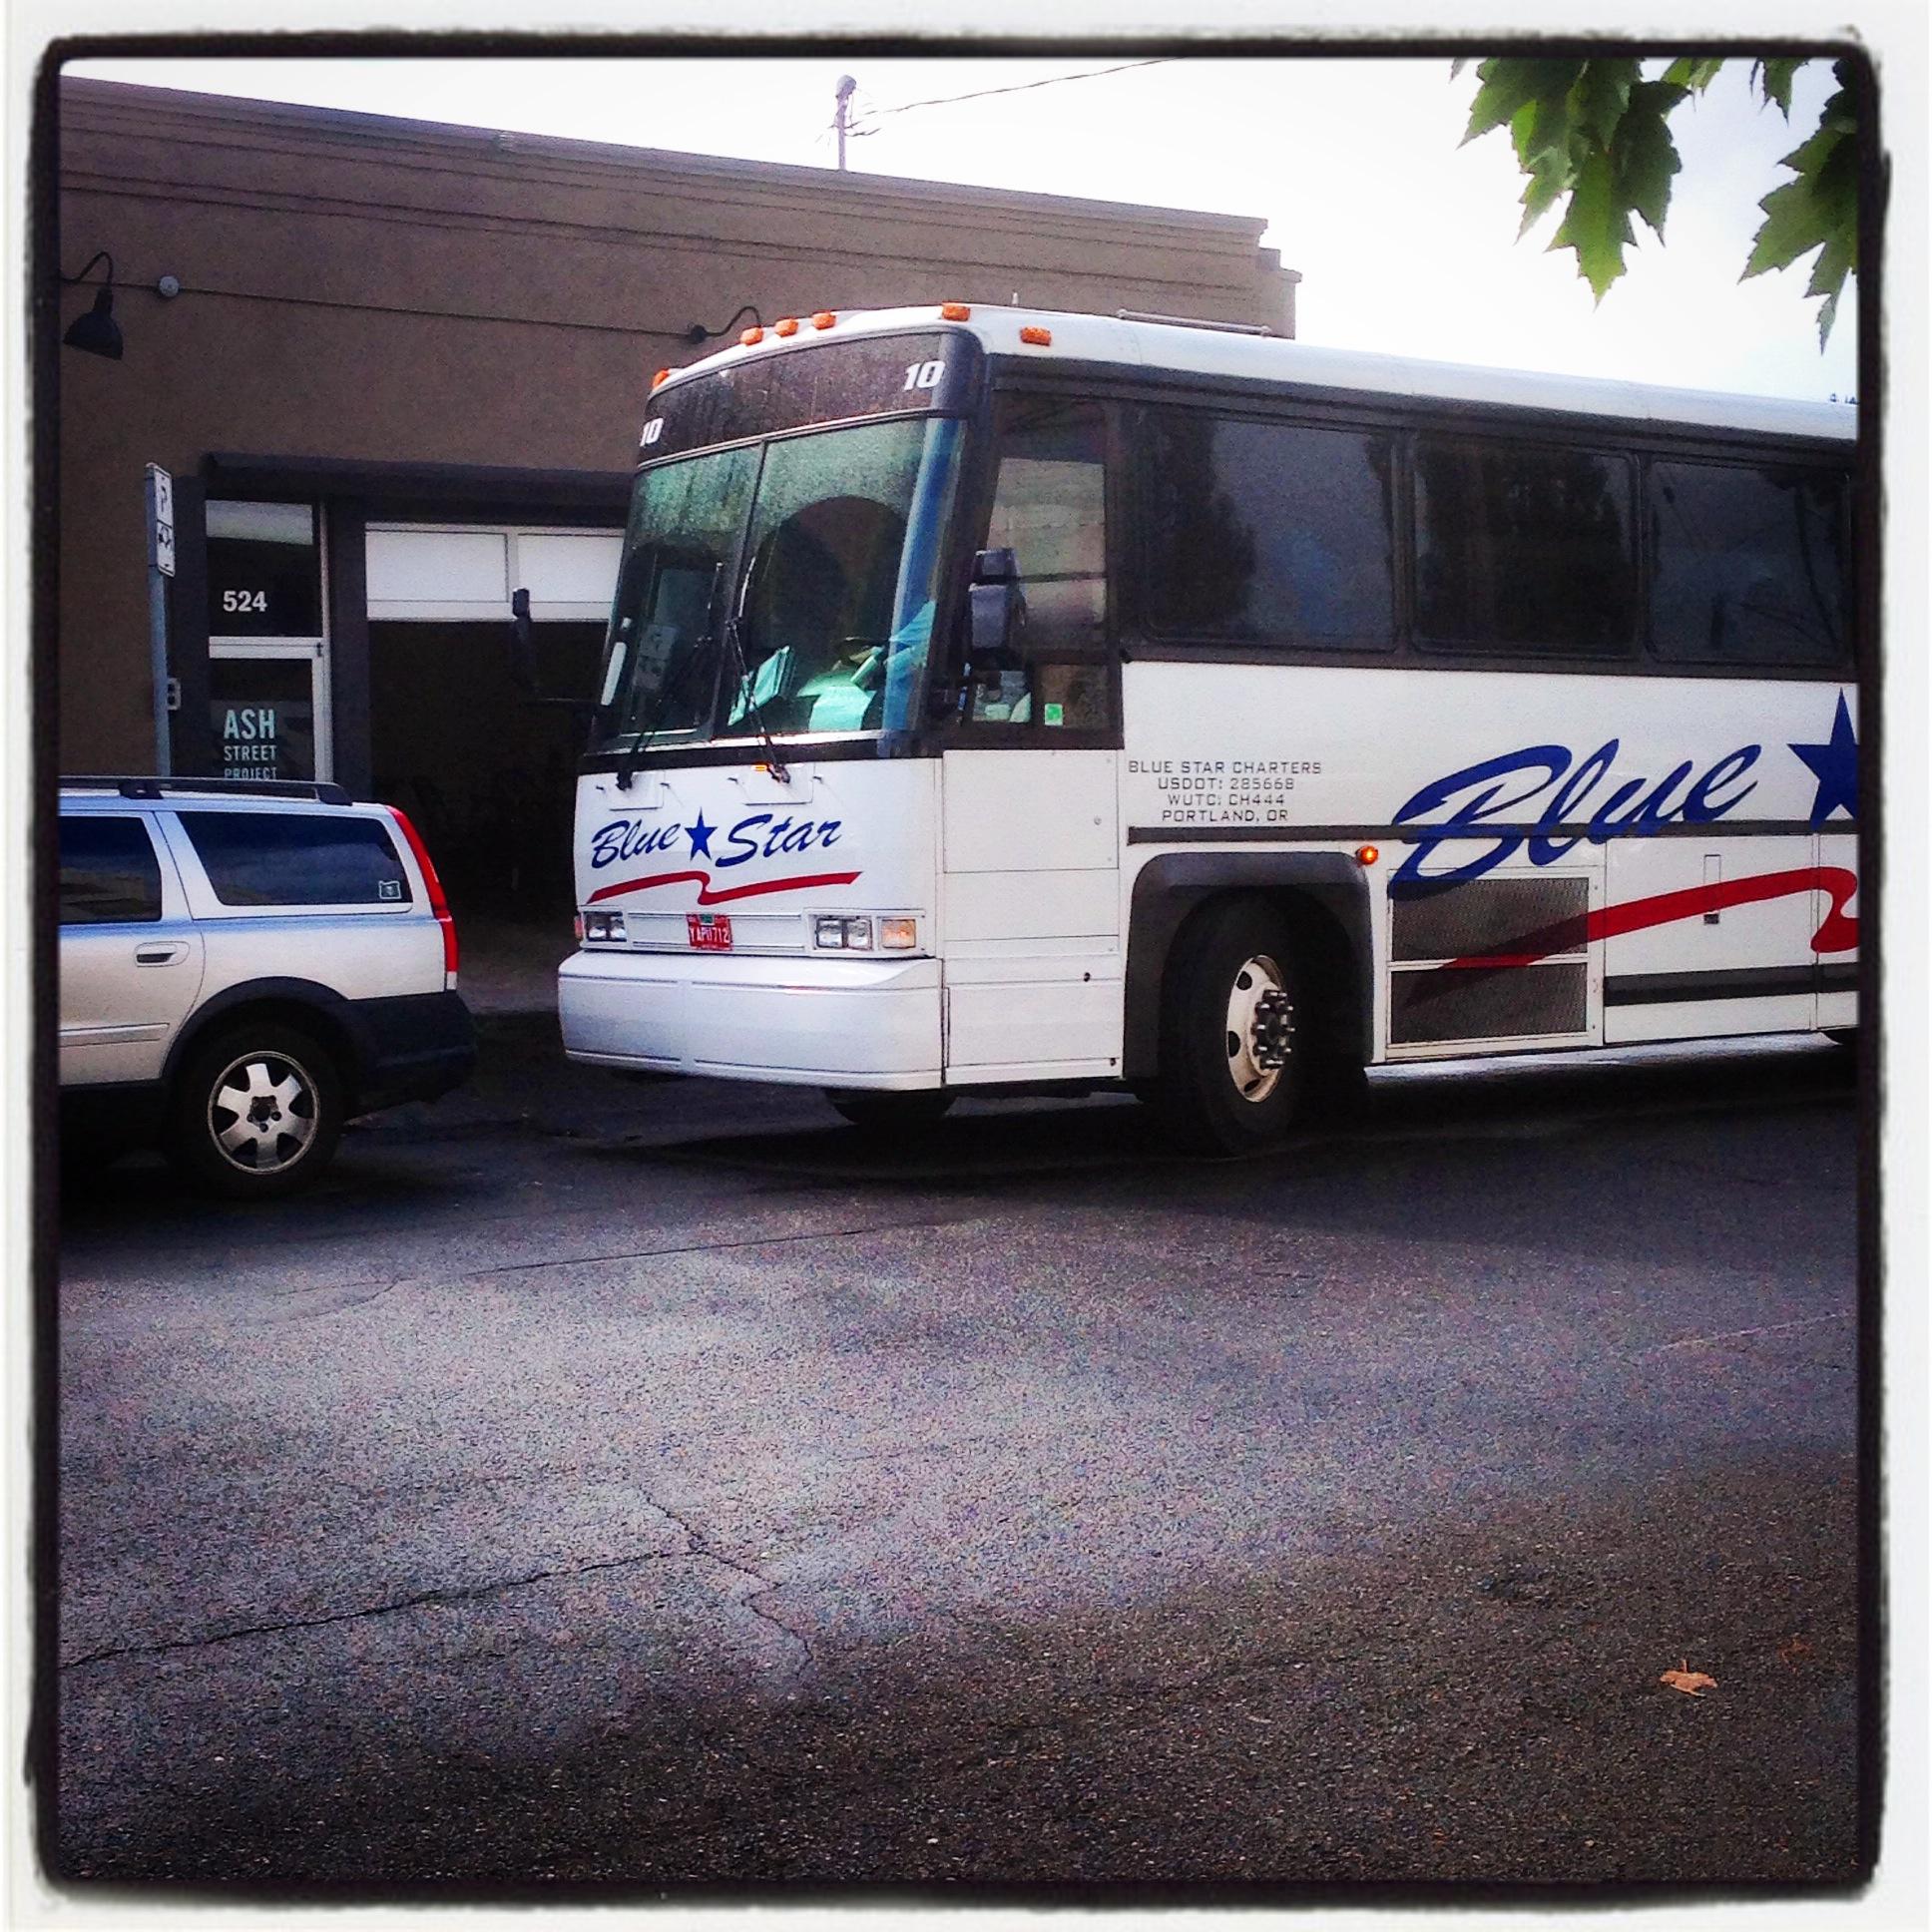 Bus Tour Stop at Ash Street Project